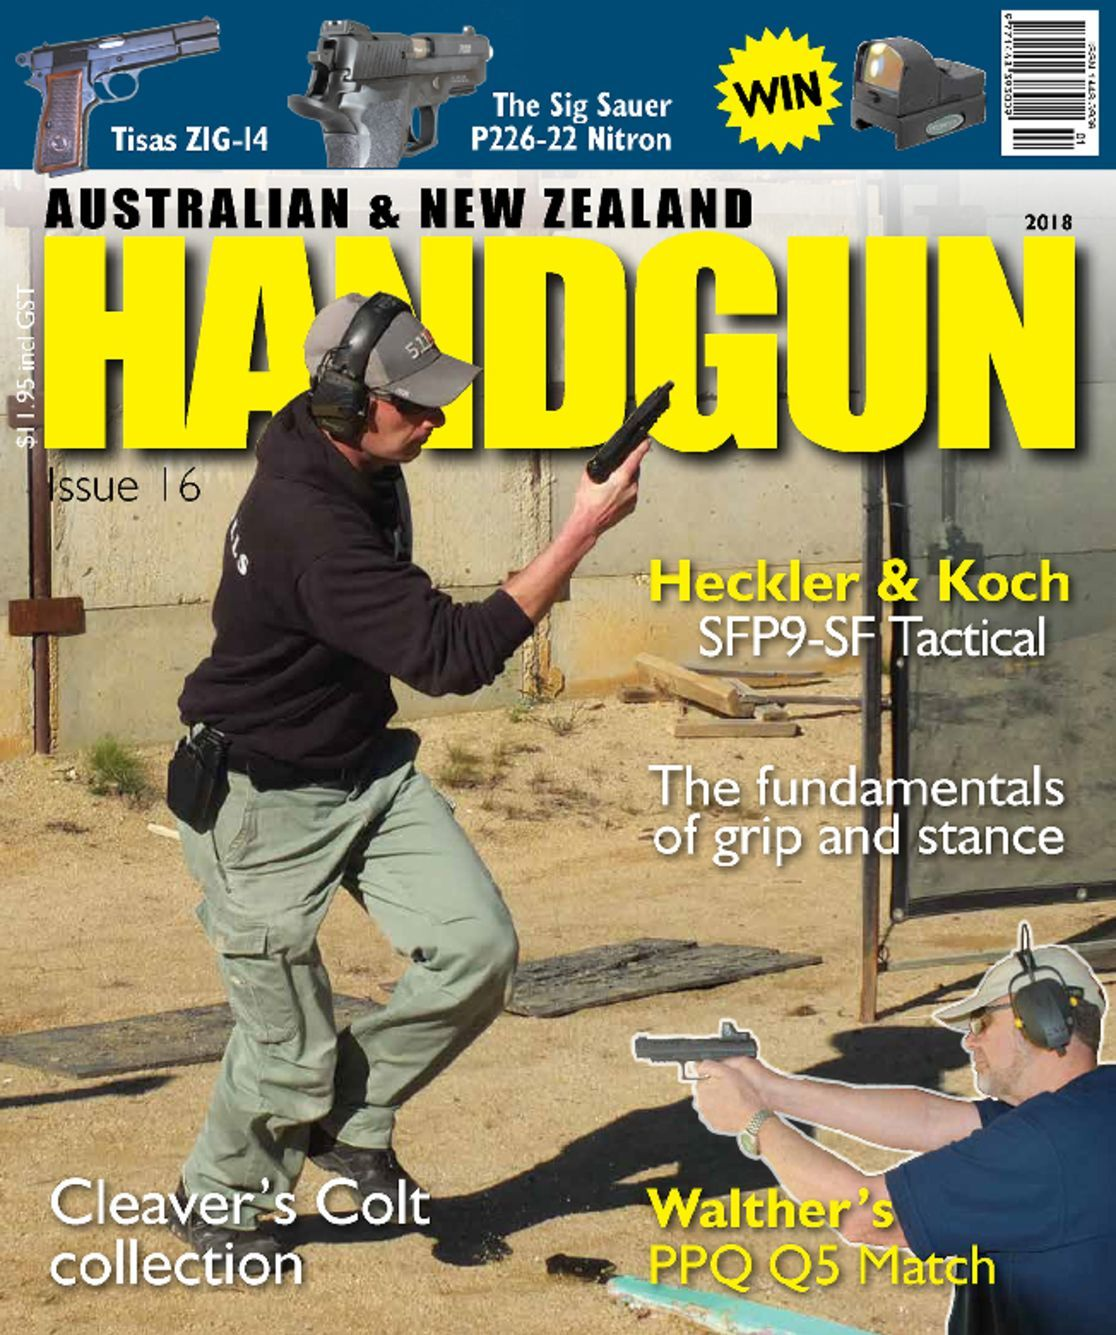 Australian New Zealand Handgun Digital